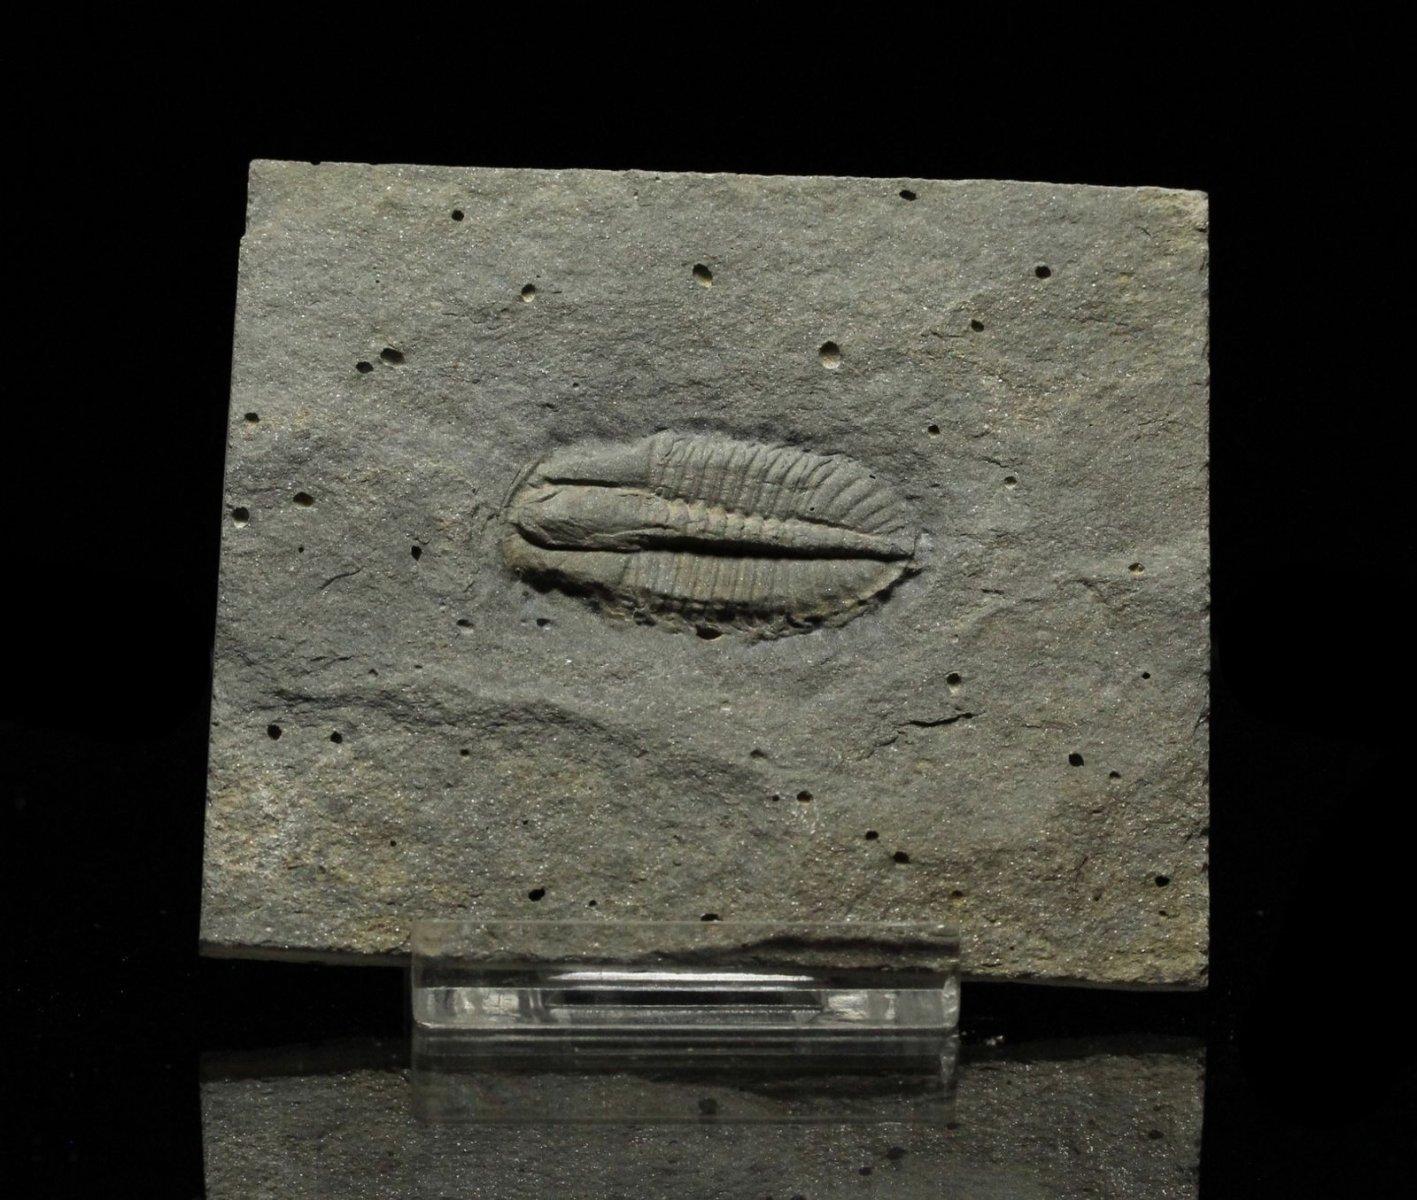 Ogygopis sp. Trilobite